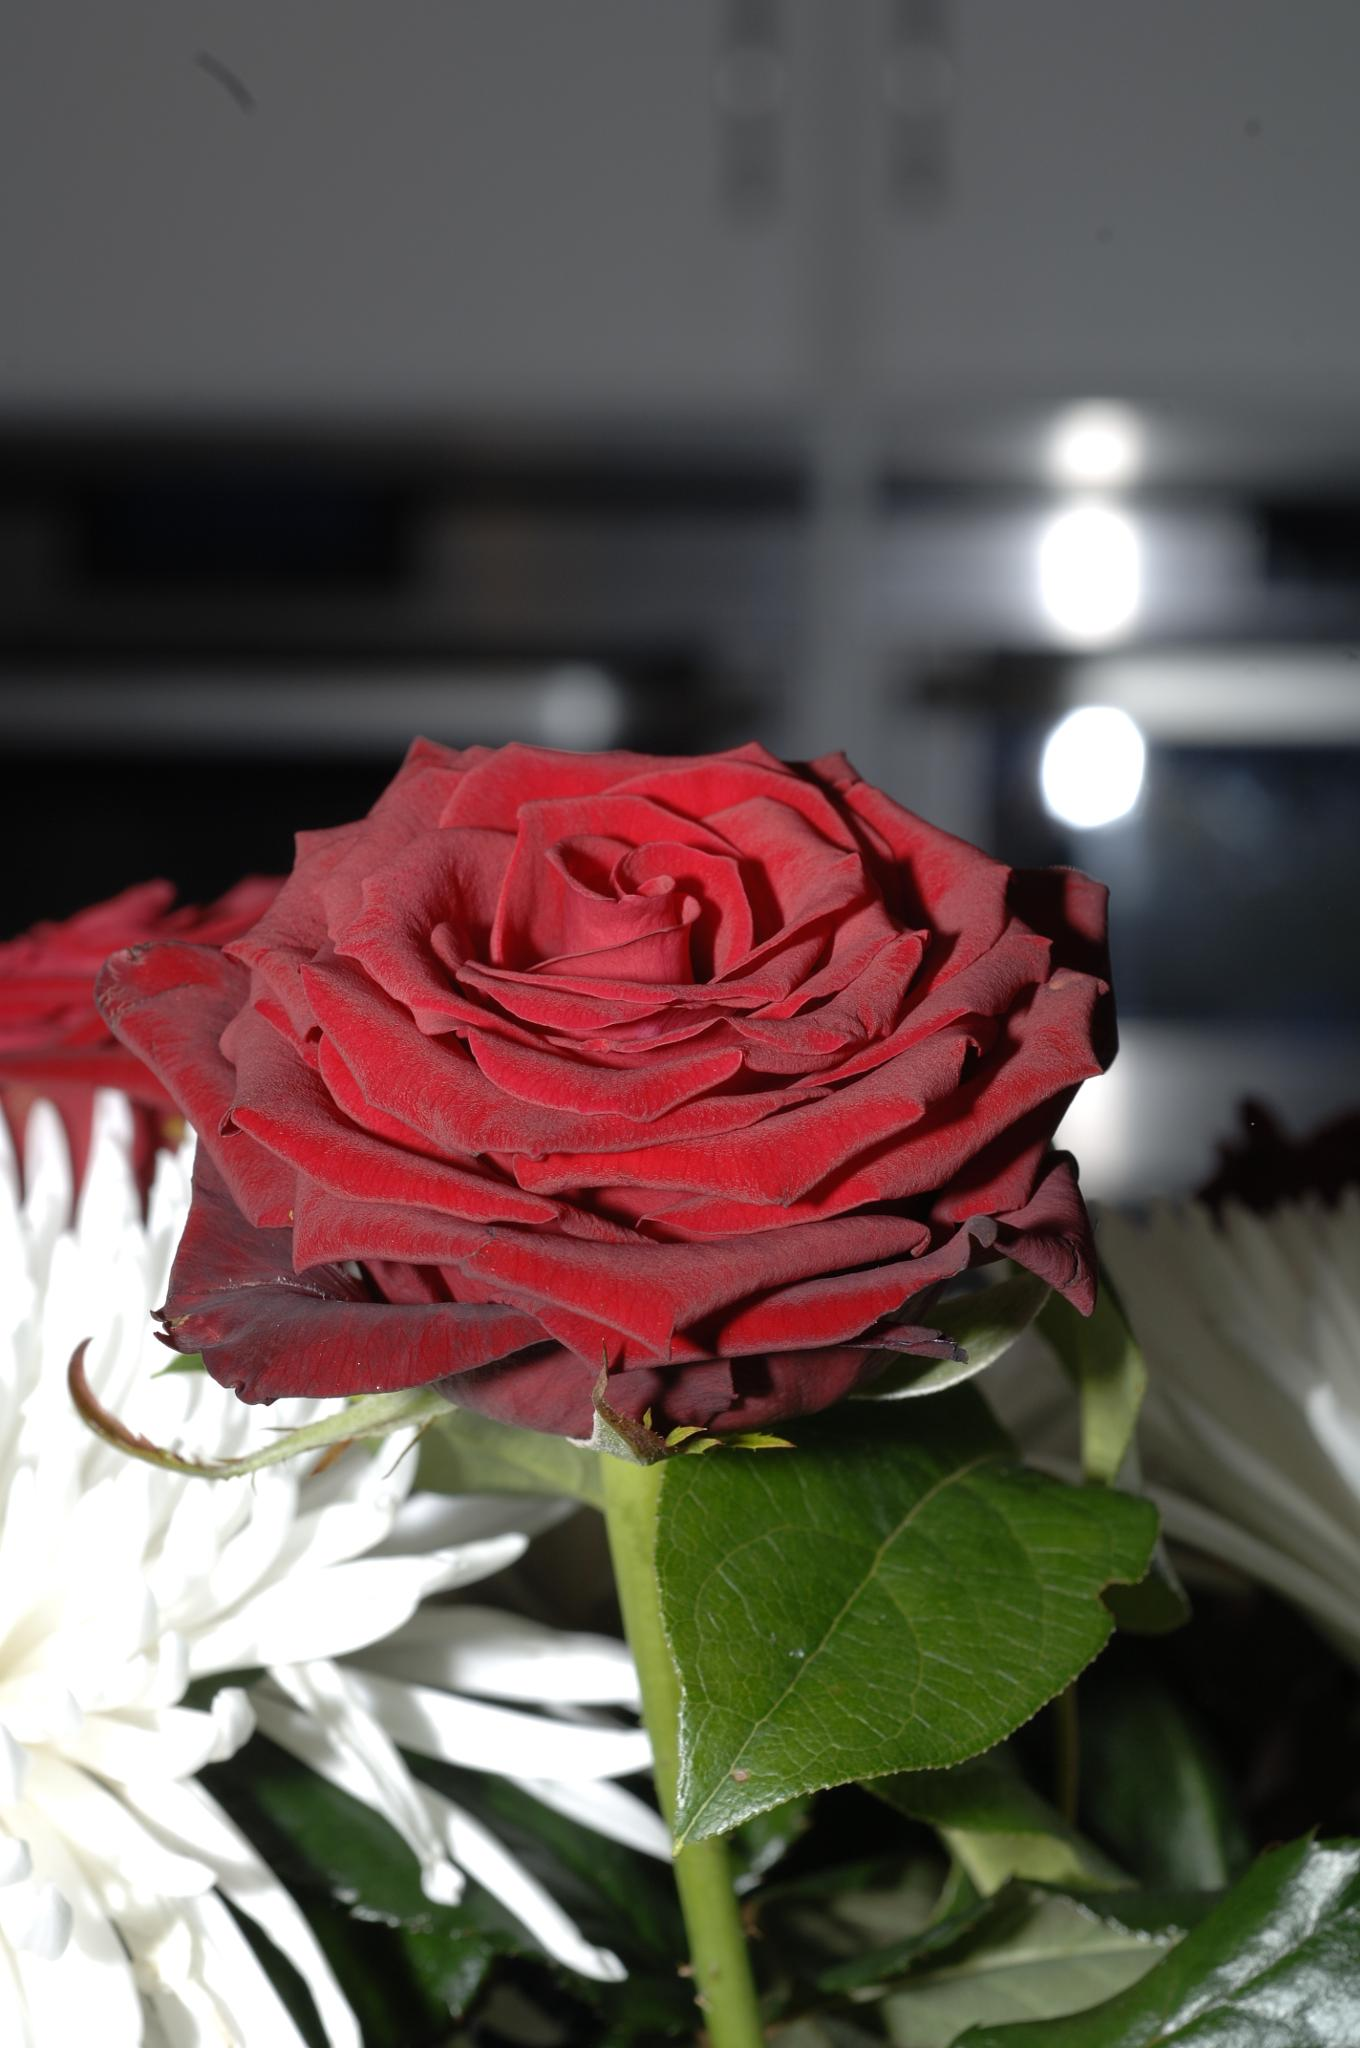 my red rose by Tom Augo Lynge